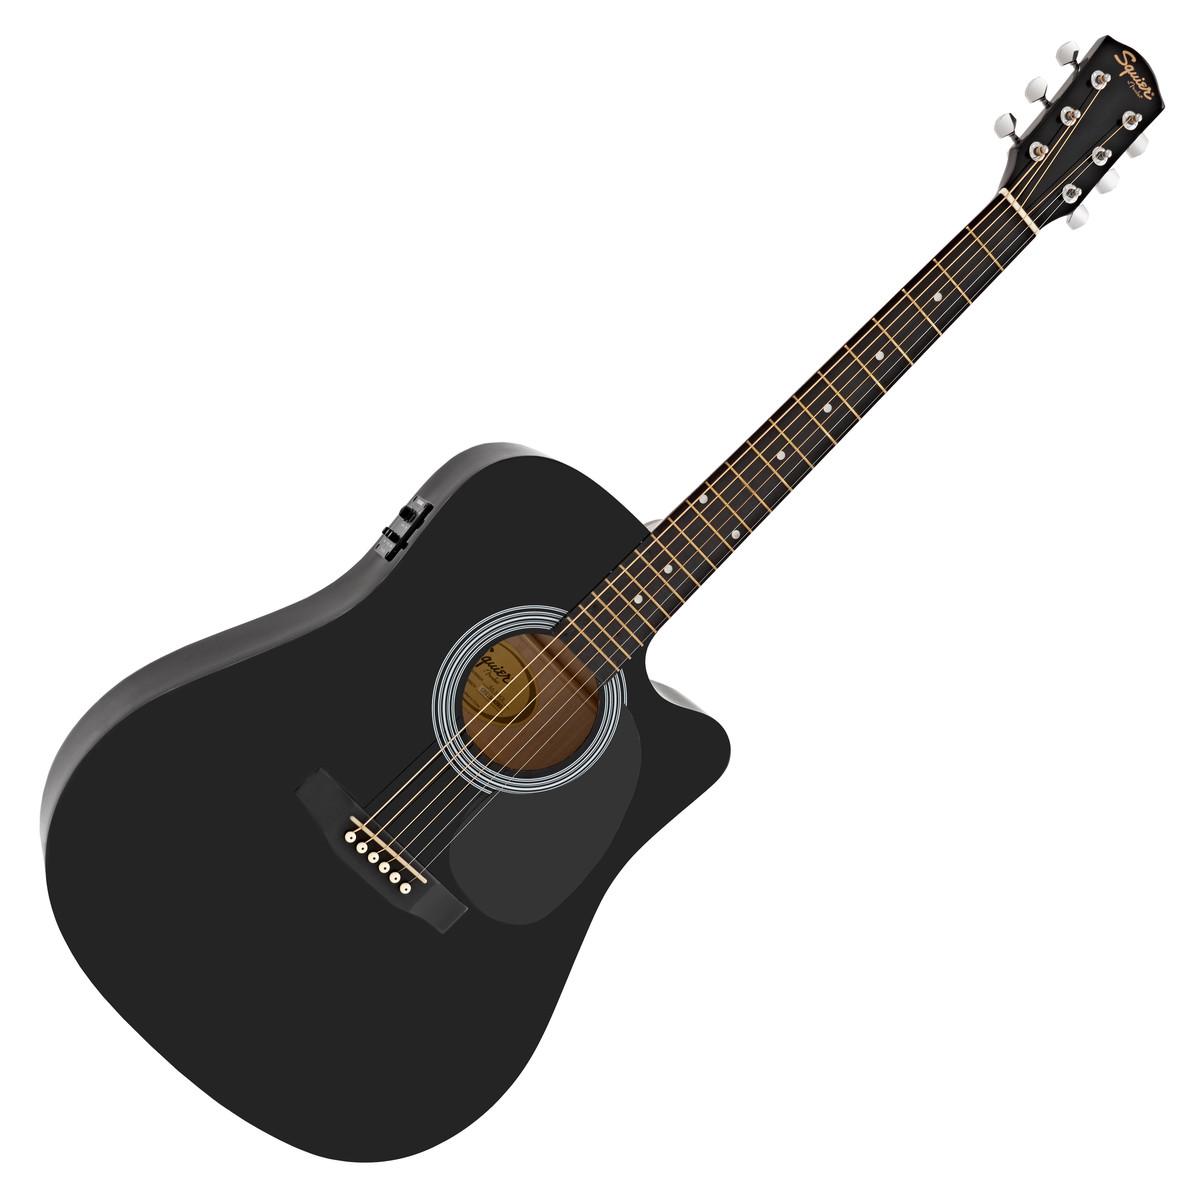 squier od fender elektro akustick kytara sa 105ce ern na. Black Bedroom Furniture Sets. Home Design Ideas